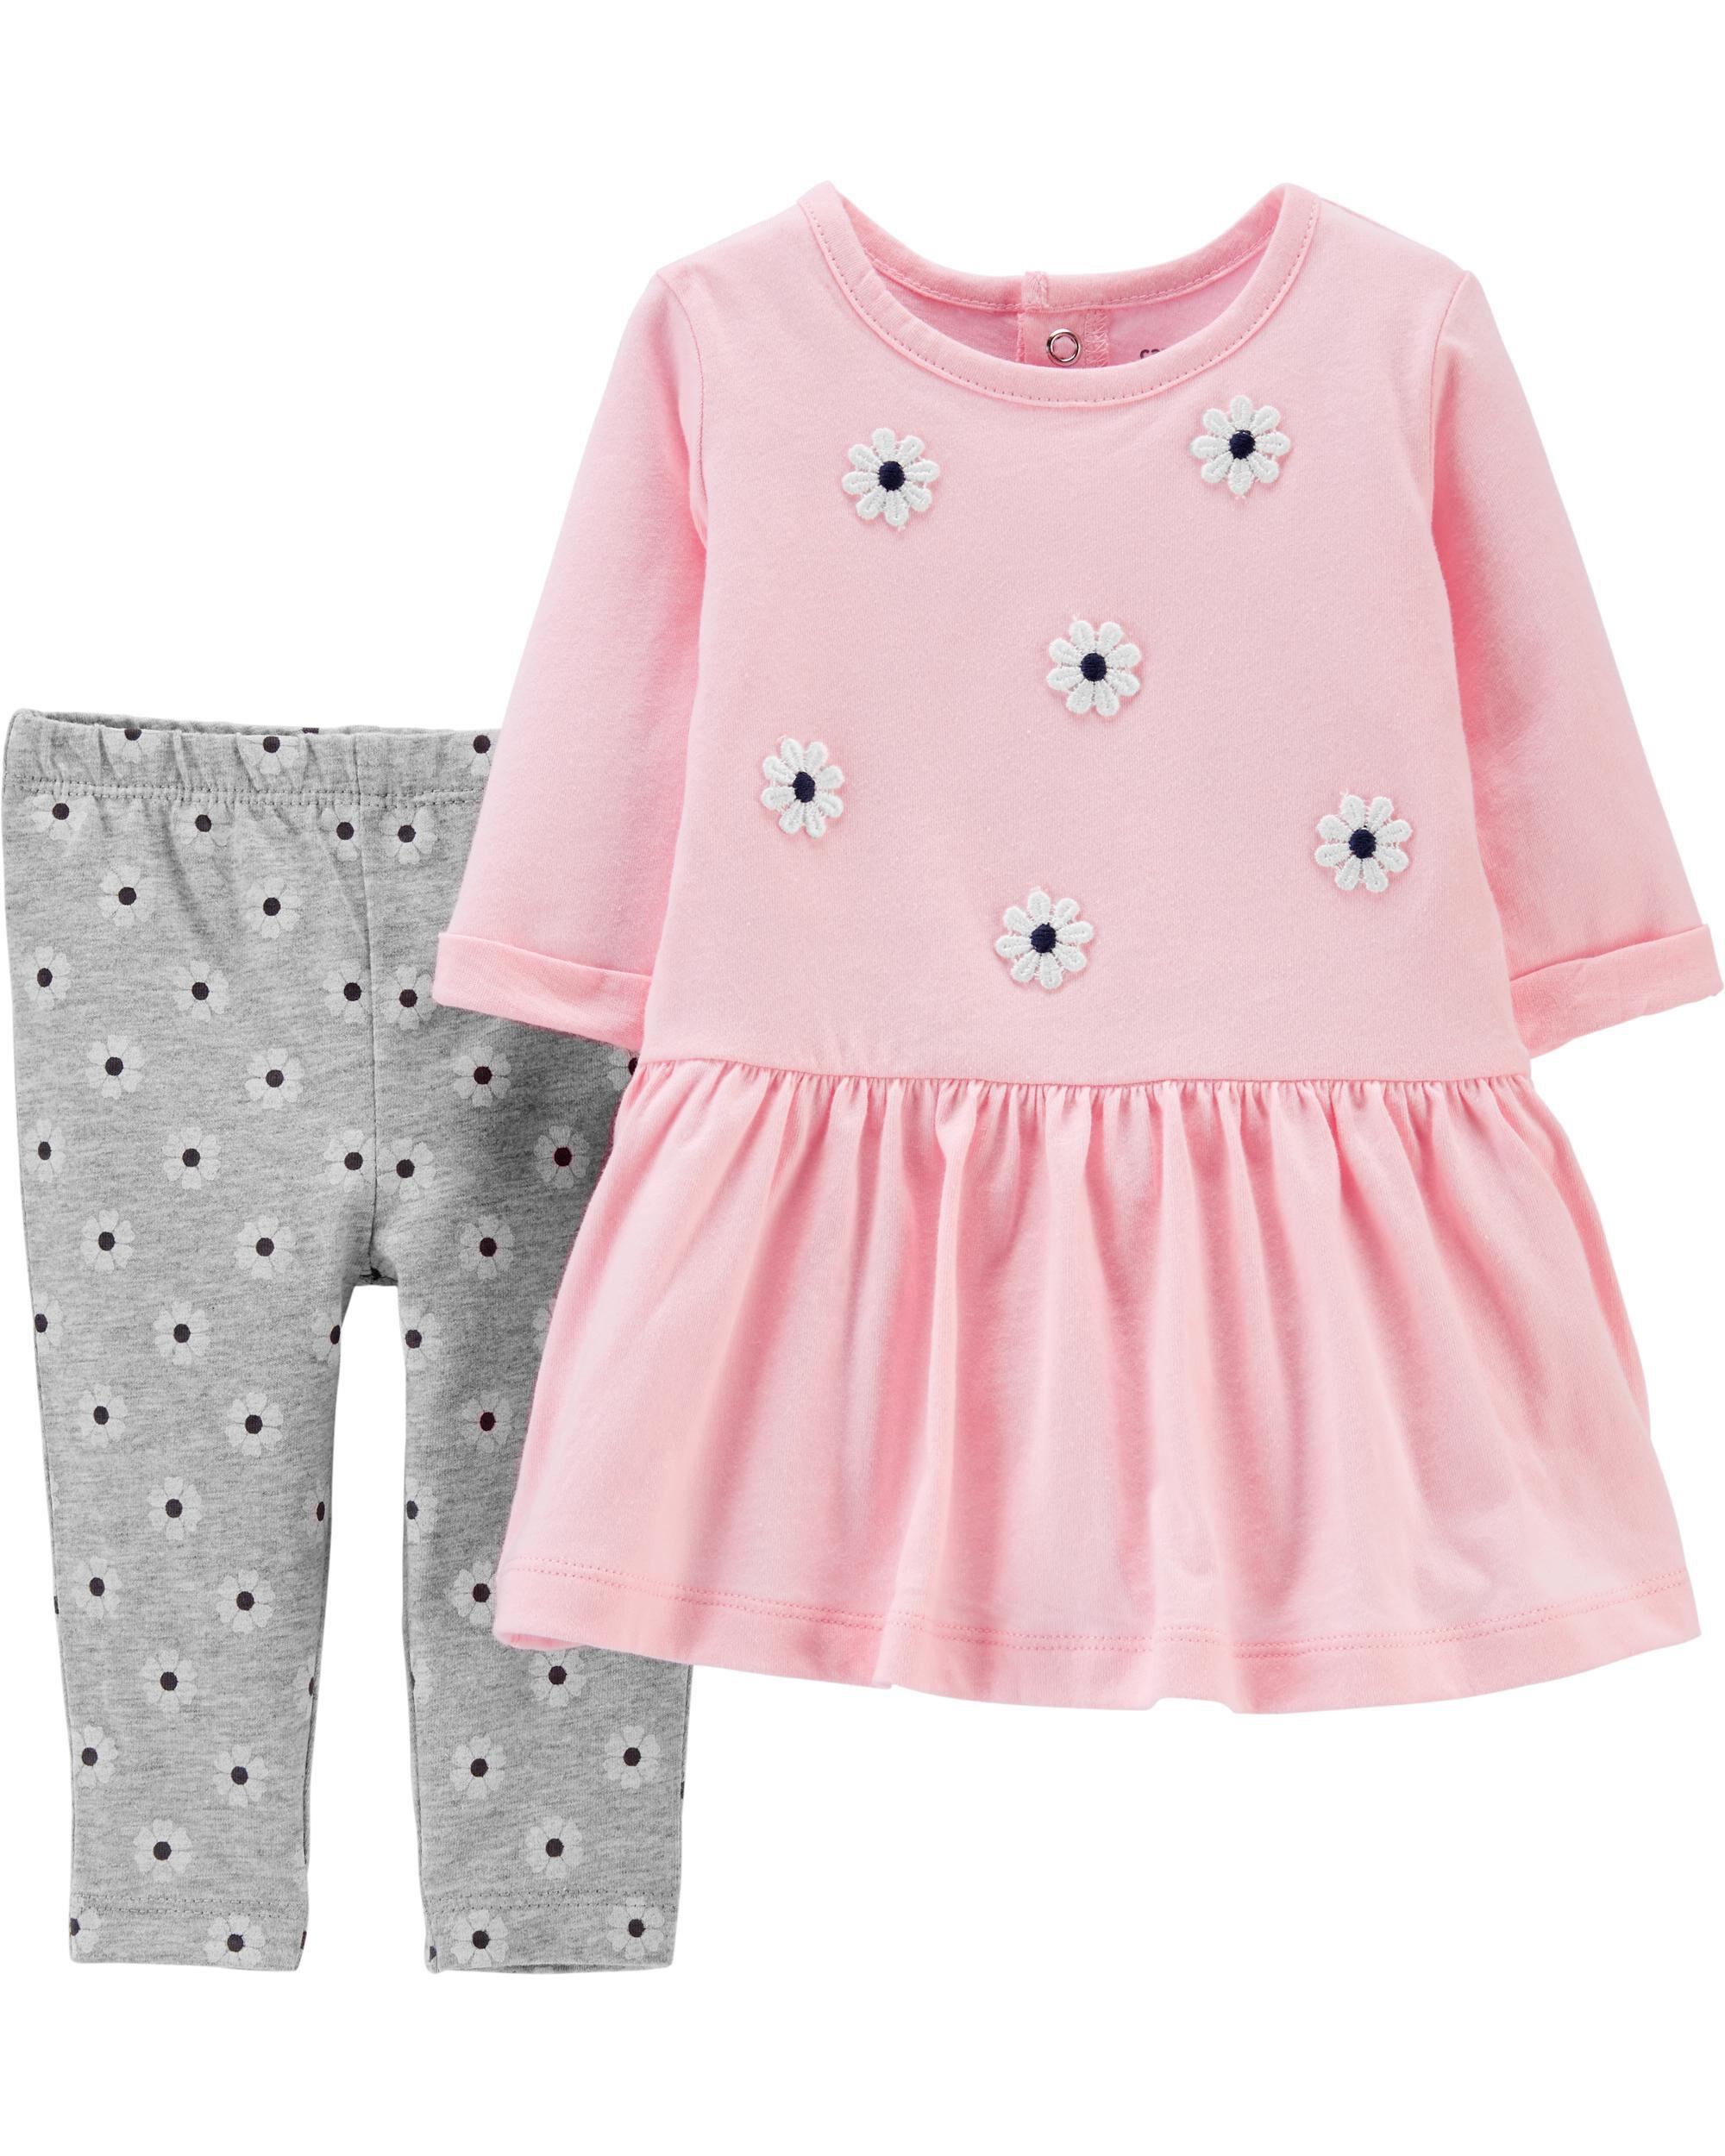 *Clearance*  2-Piece Floral Jersey Dress & Leggi...